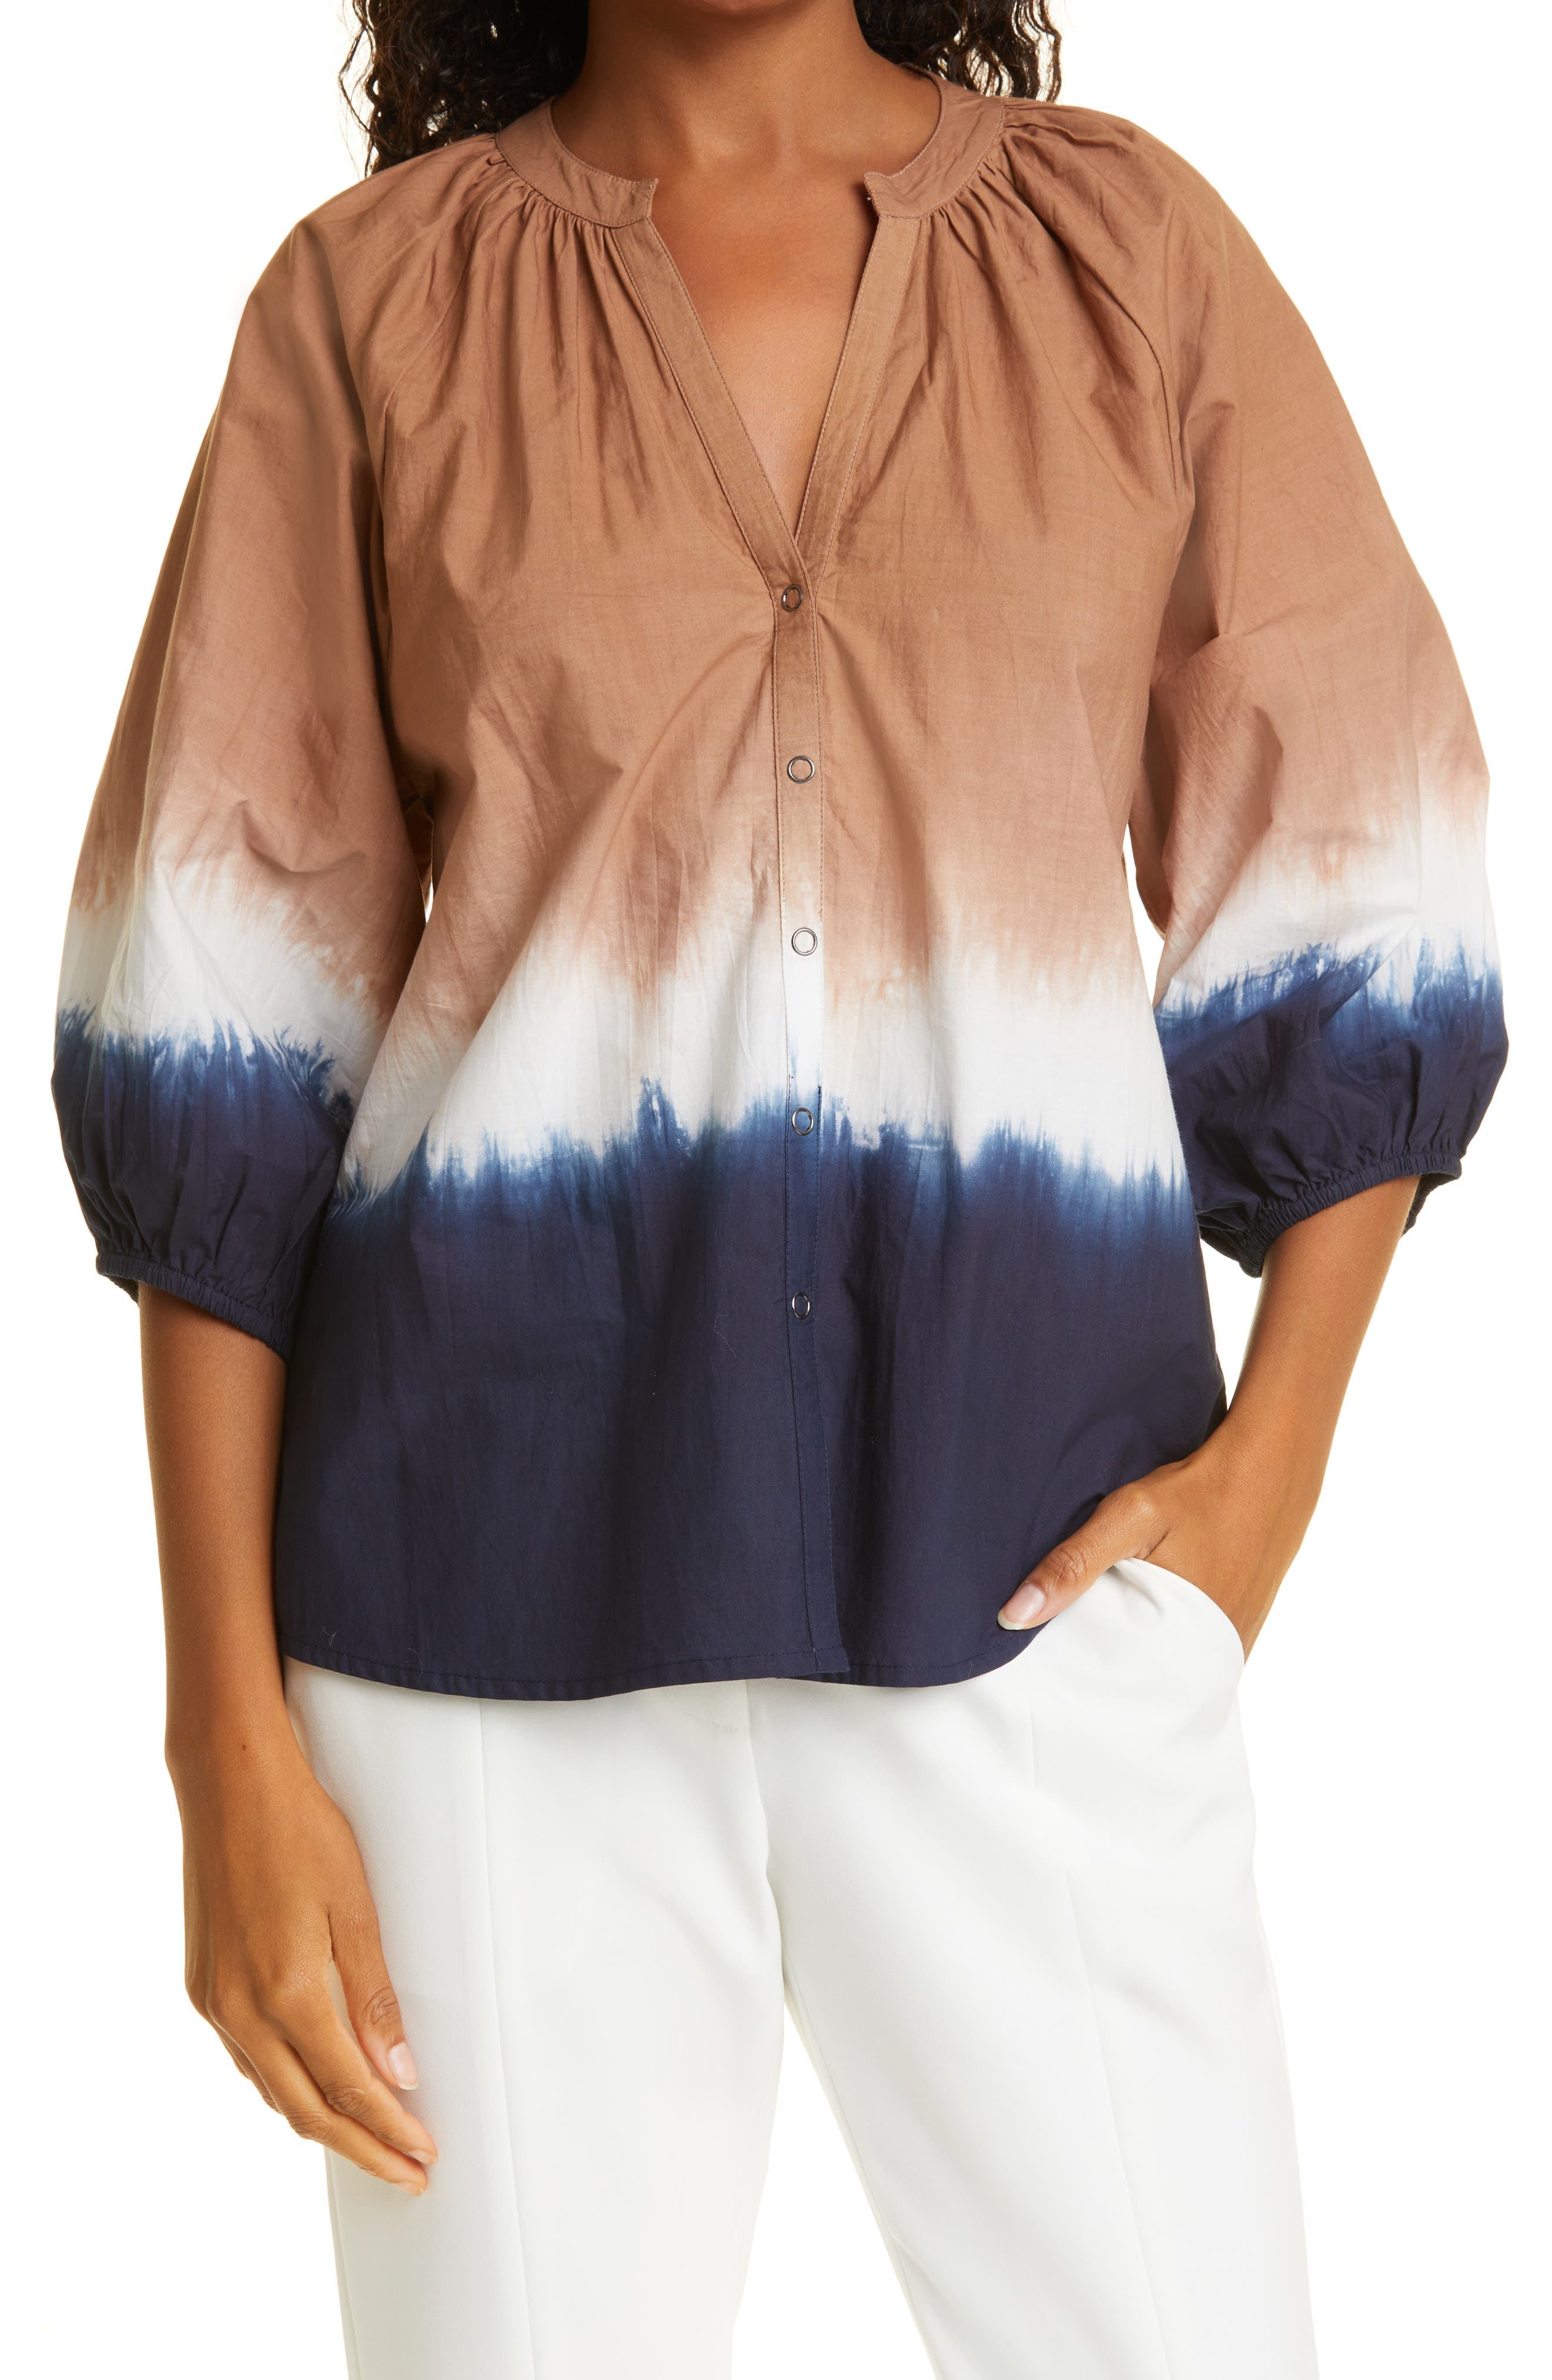 Mitte Tie Dye Organic Cotton Top